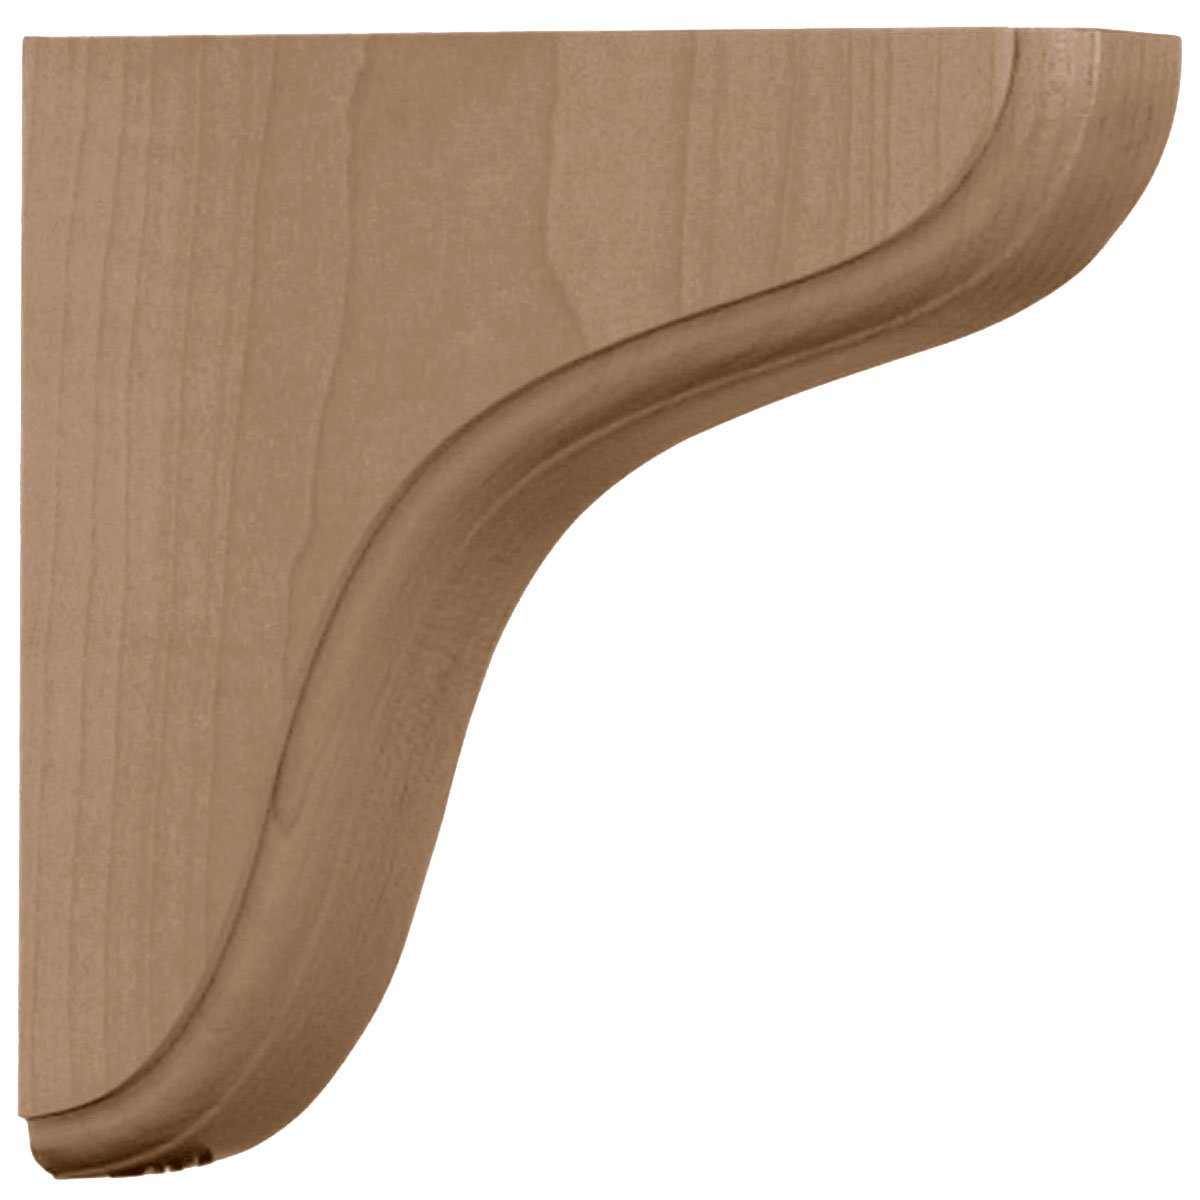 , 4-Pack Ekena Millwork BKTW02X08X08EARO-CASE-4 1 3//4 inch W x 7 1//2 inch D x 7 1//2 inch H Eaton Wood Bracket Red Oak